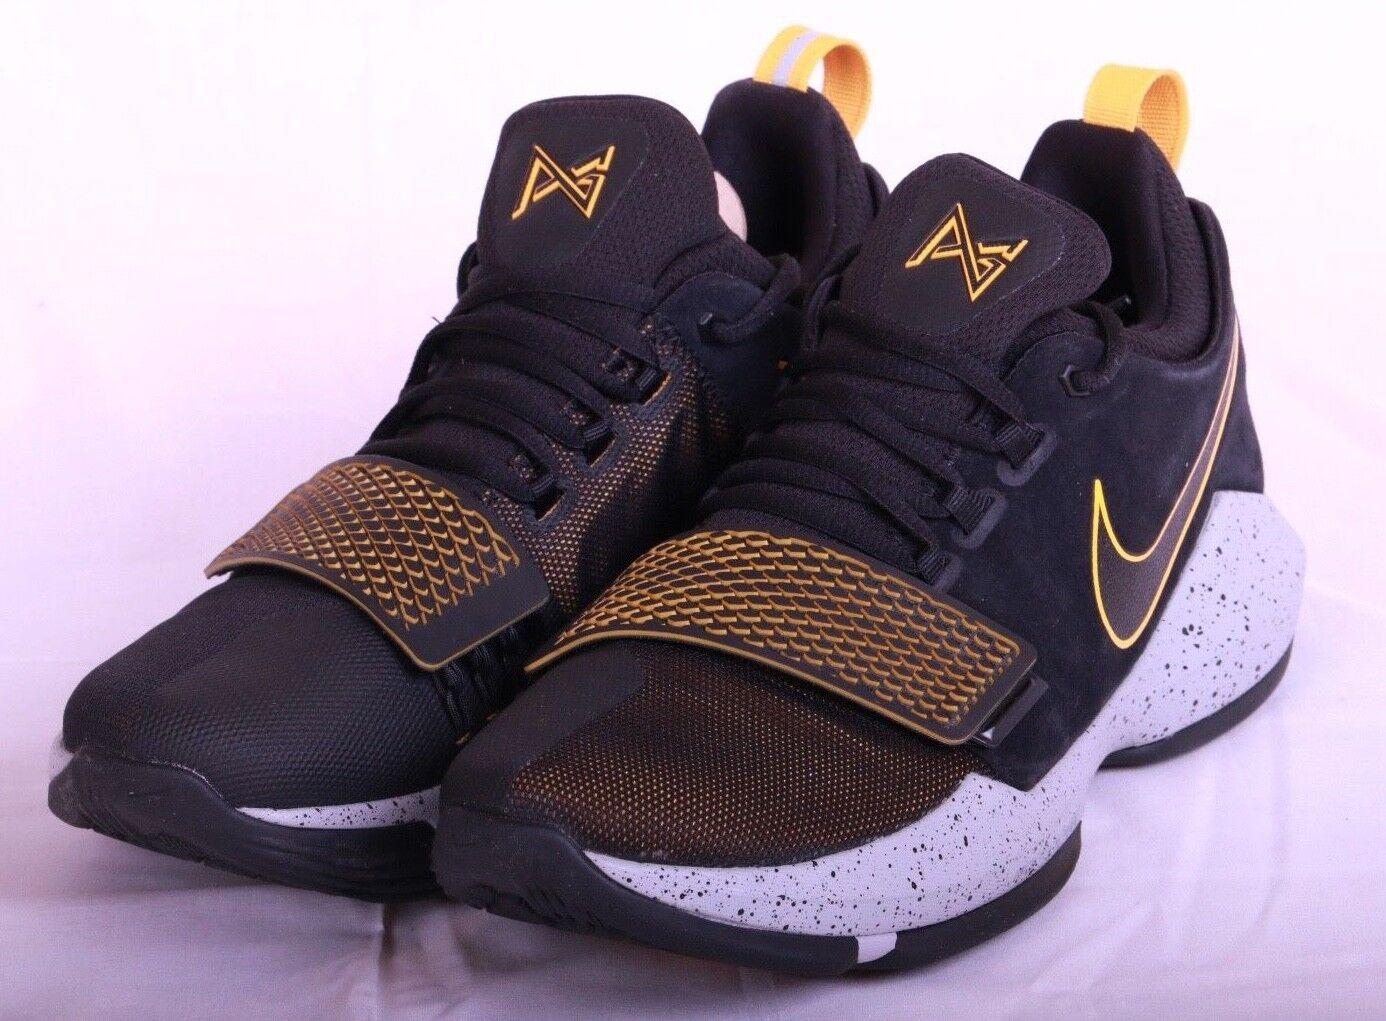 77807551b0da Nike PG 1 Mens Black Grey Grey Grey University Gold Basketball Shoes 878627  006 Size 10.5 30ee53